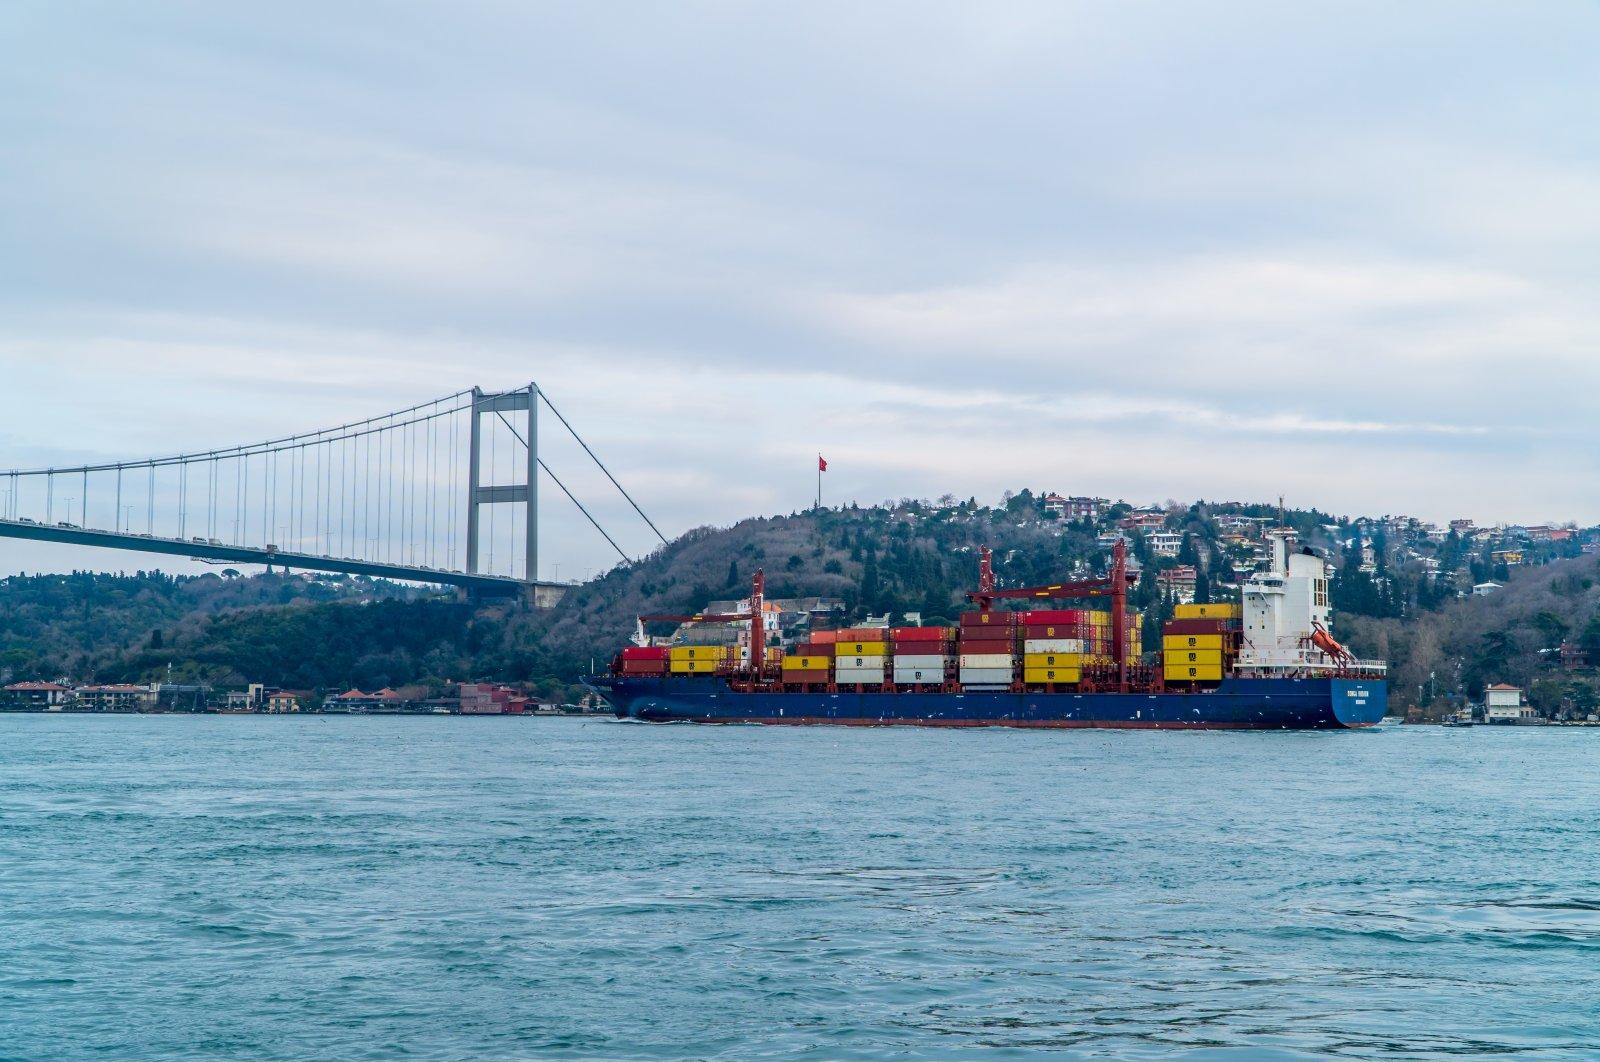 A container ship sails through the Bosporus passing under the Fatih Sultan Mehmet Bridge in Istanbul, Turkey, Feb. 19, 2021. (Shutterstock Photo)